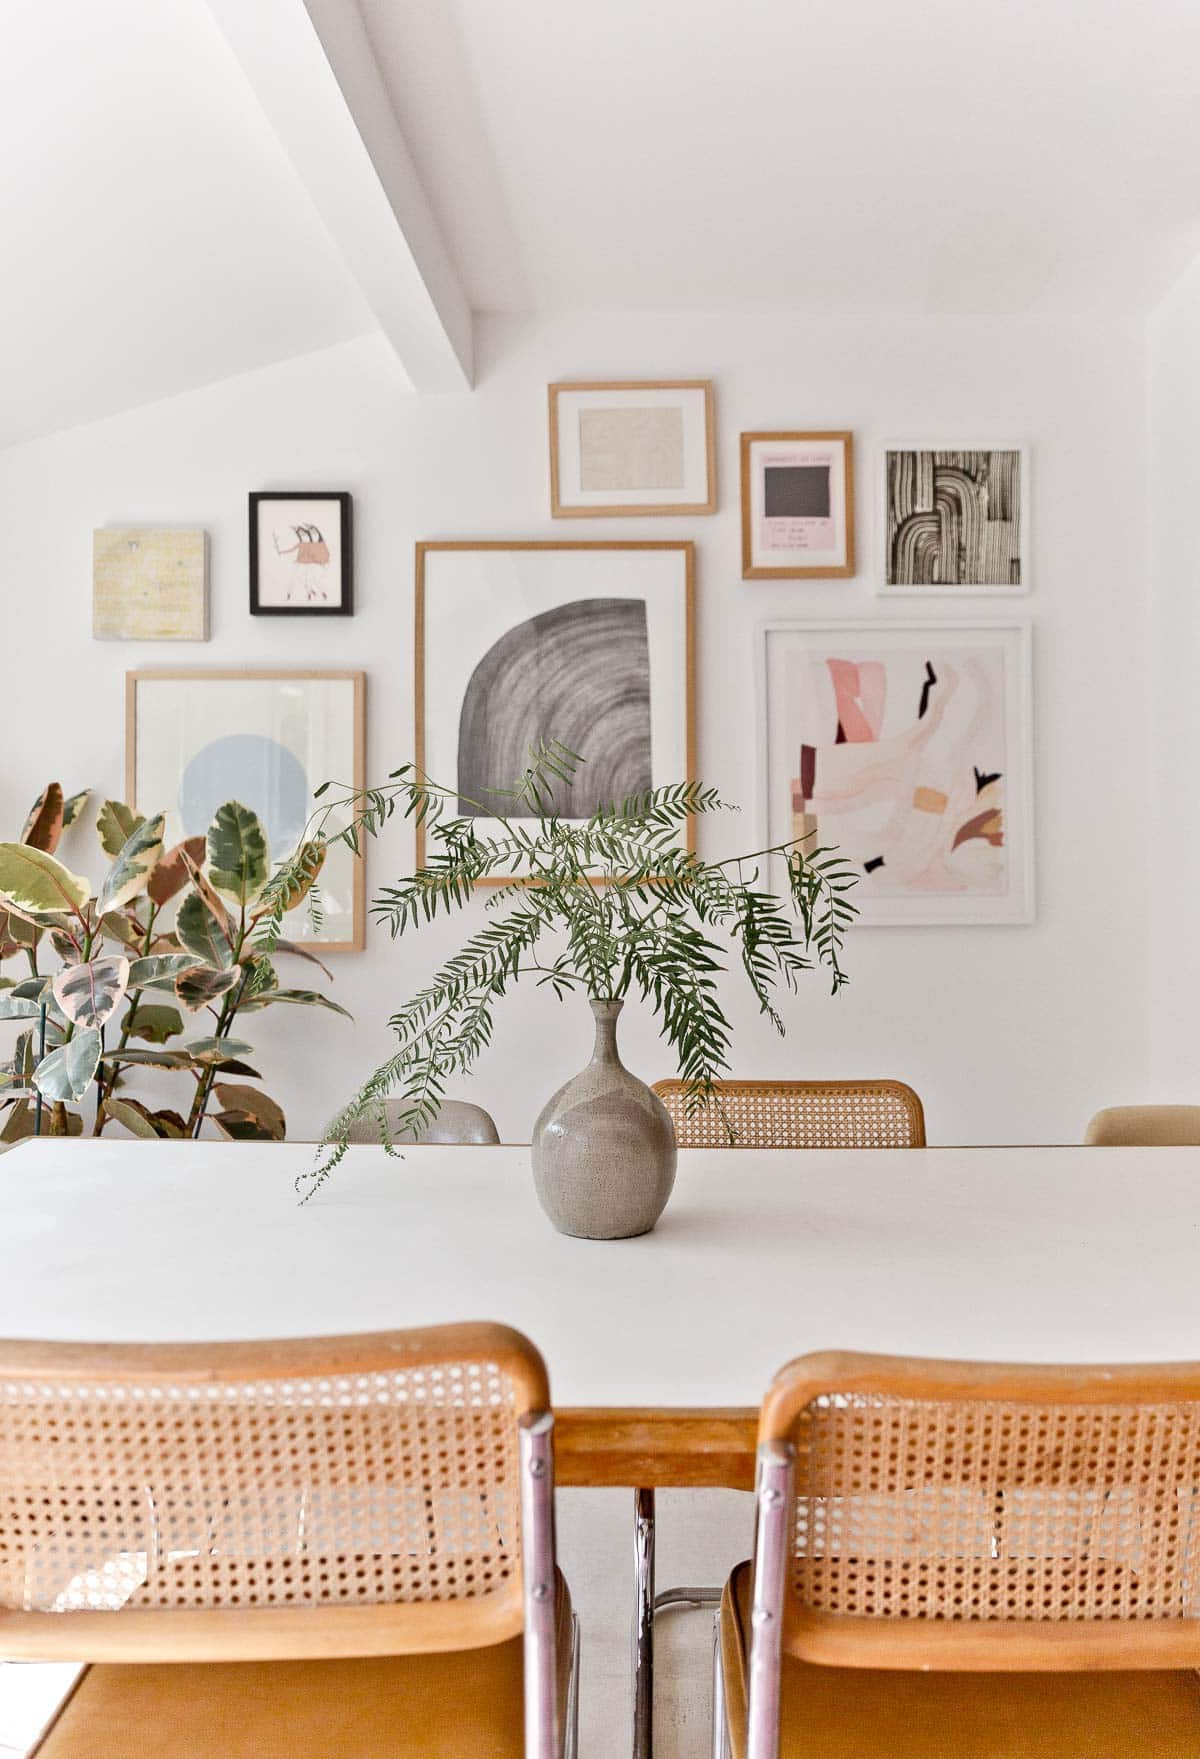 Gallery wall of artwork in modern dining room.